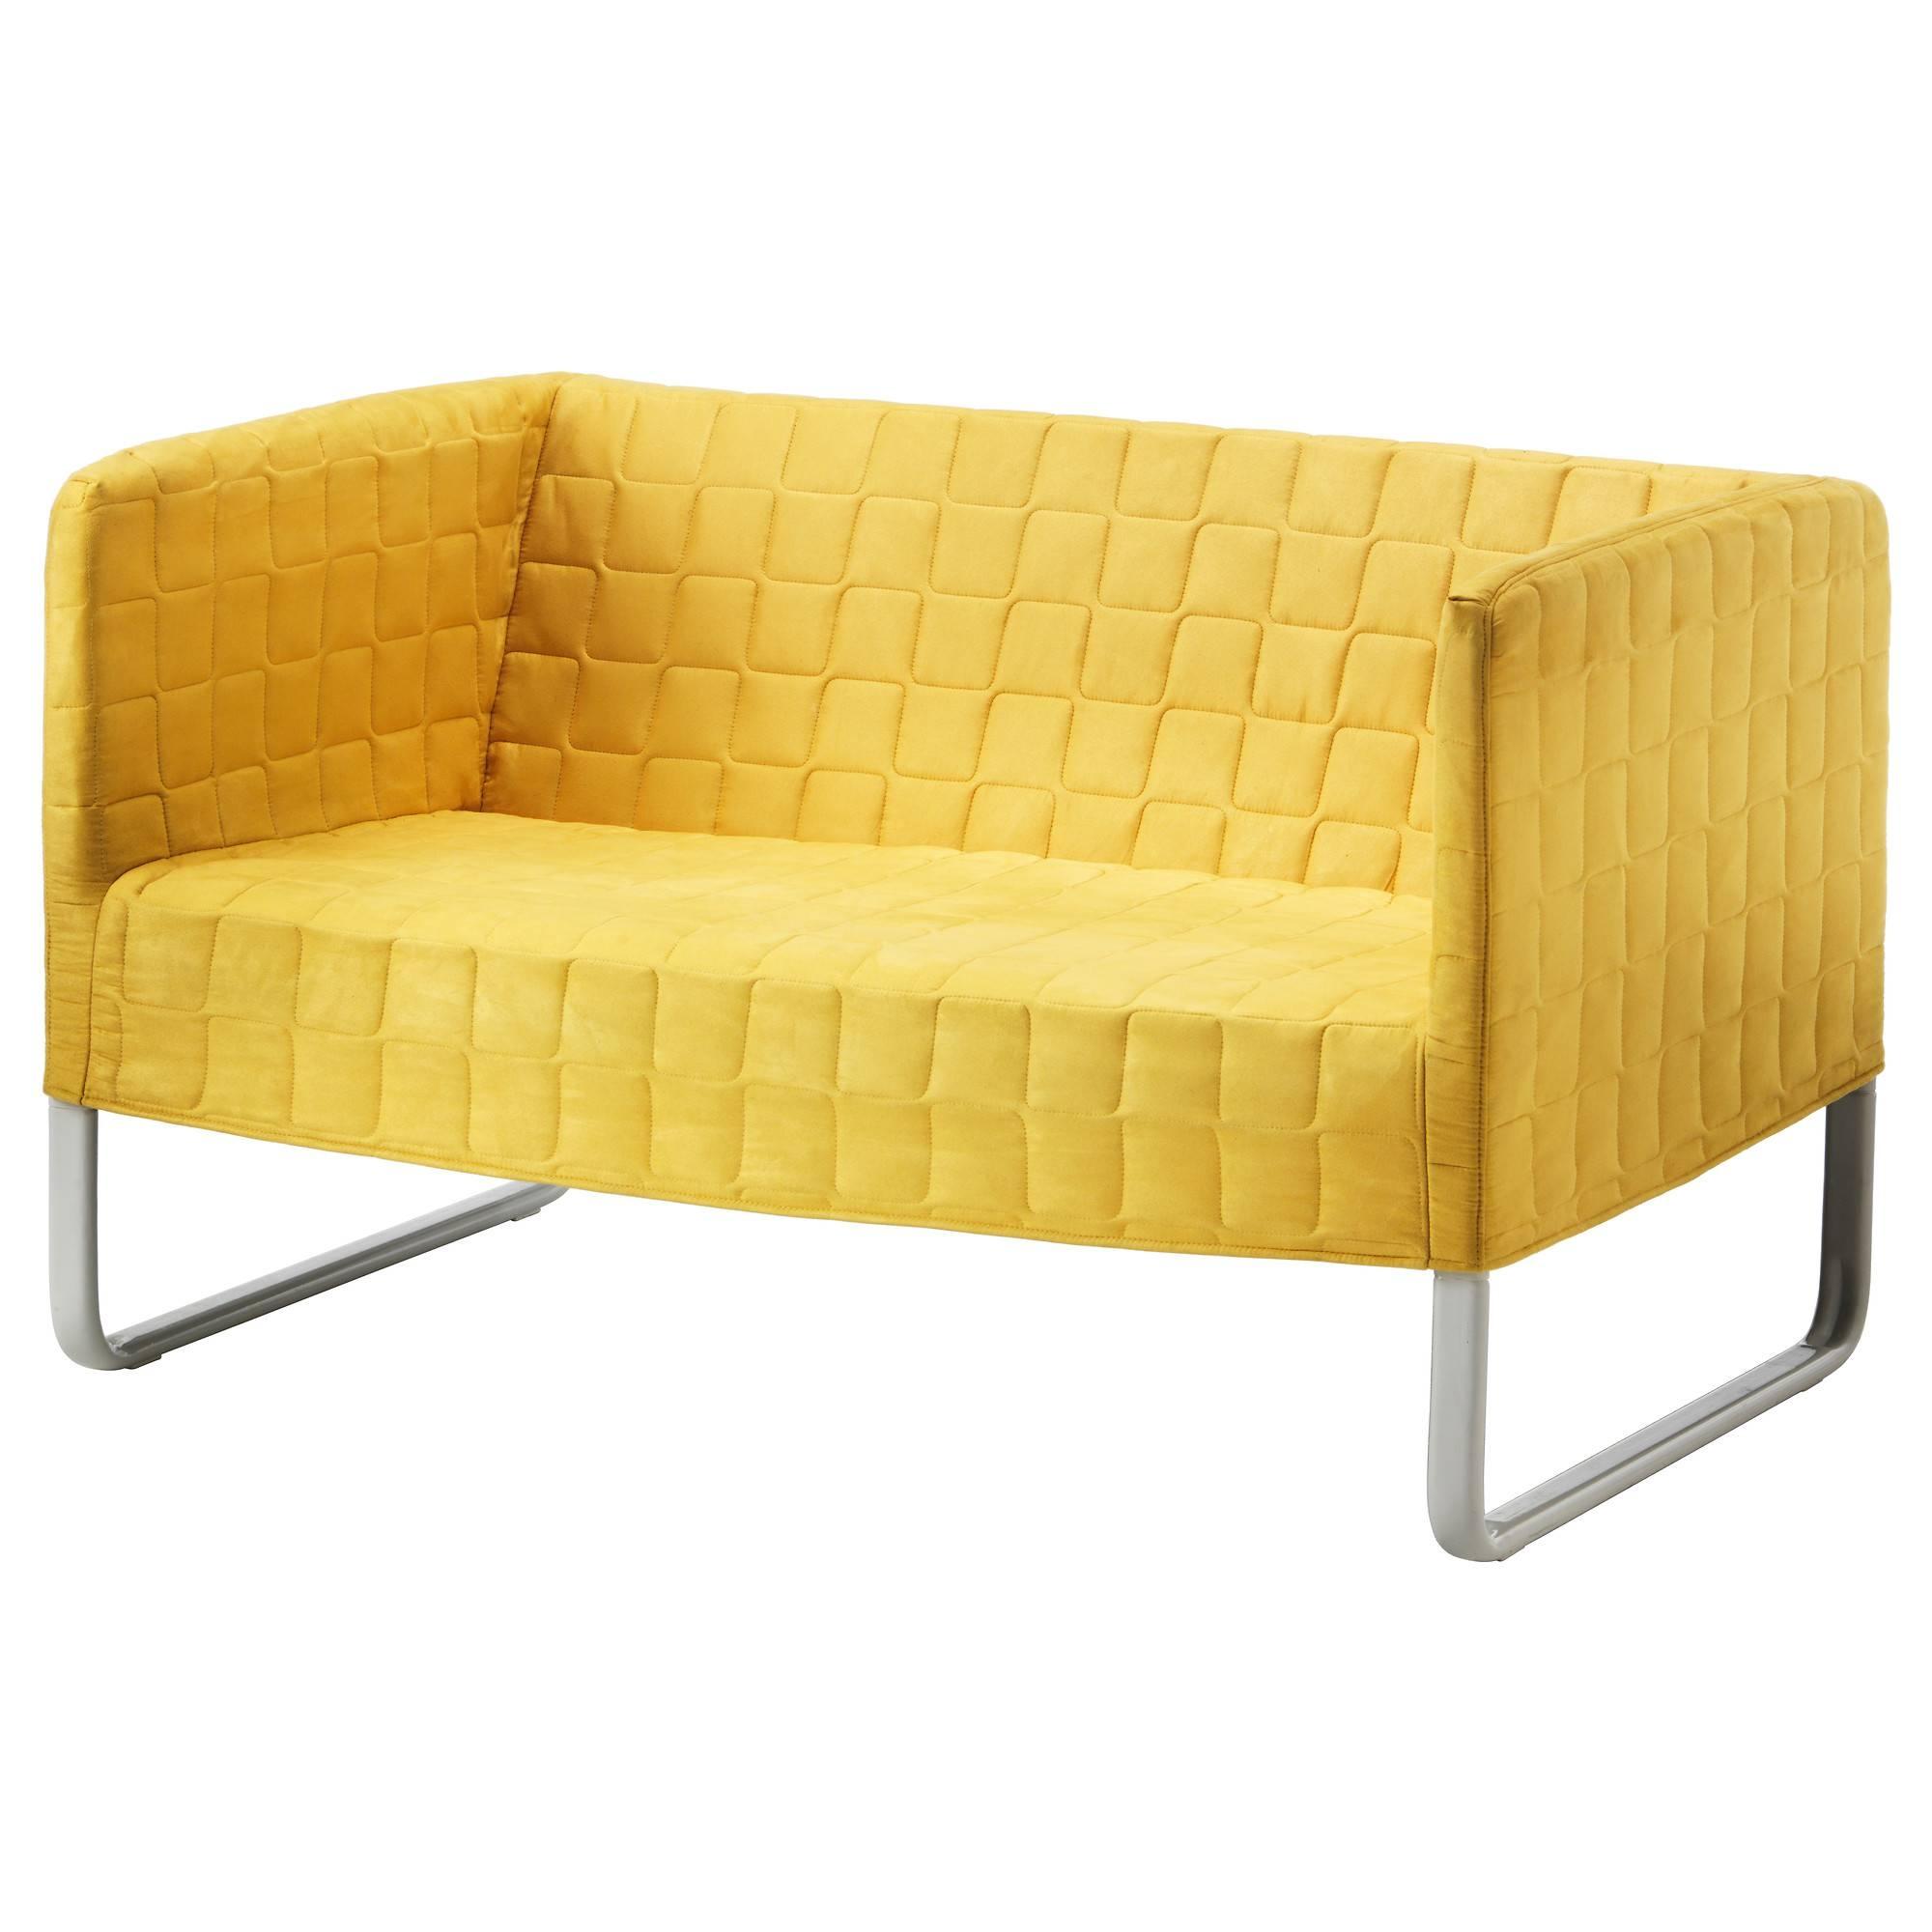 Small Sofas Ikea 49 With Small Sofas Ikea | Jinanhongyu pertaining to Small Sofas Ikea (Image 24 of 30)